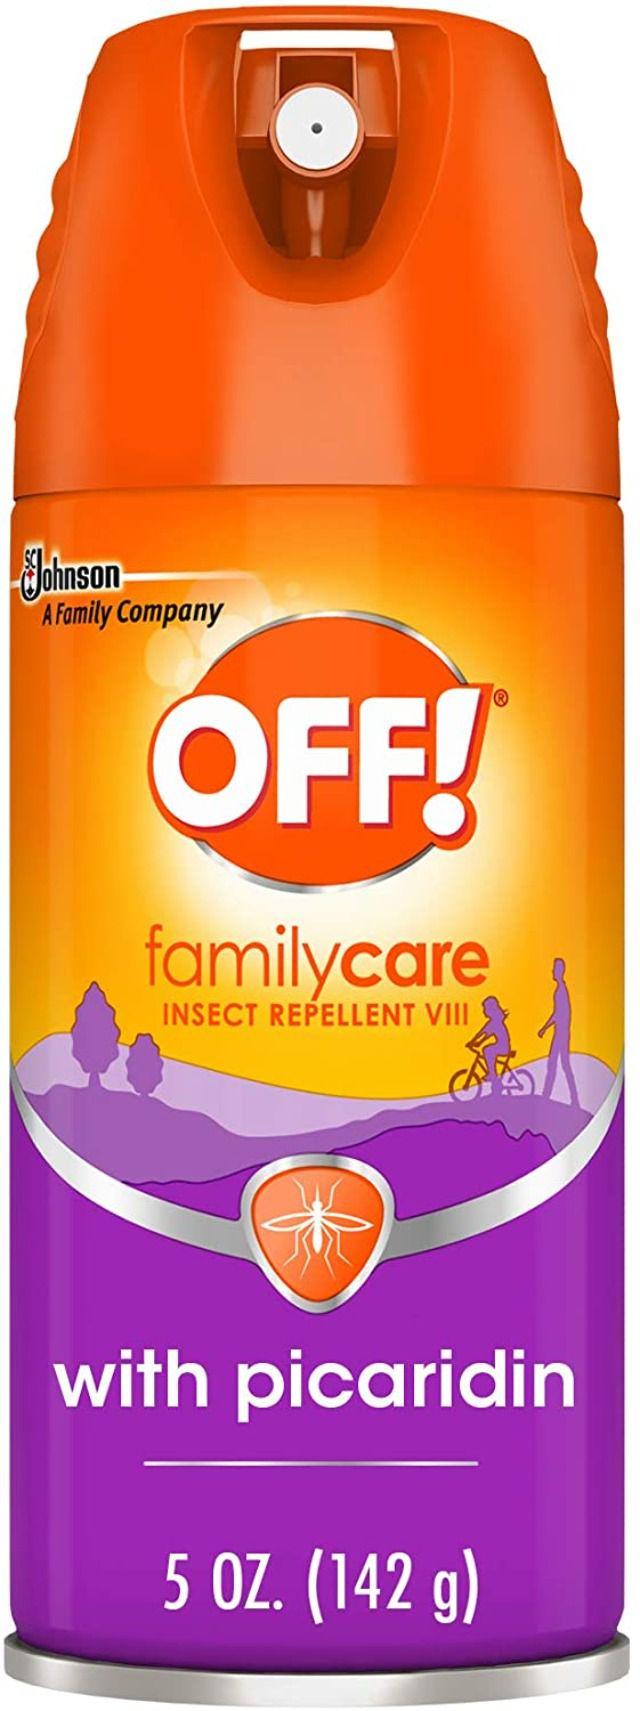 Off! Family Care Picaridin Aerosol